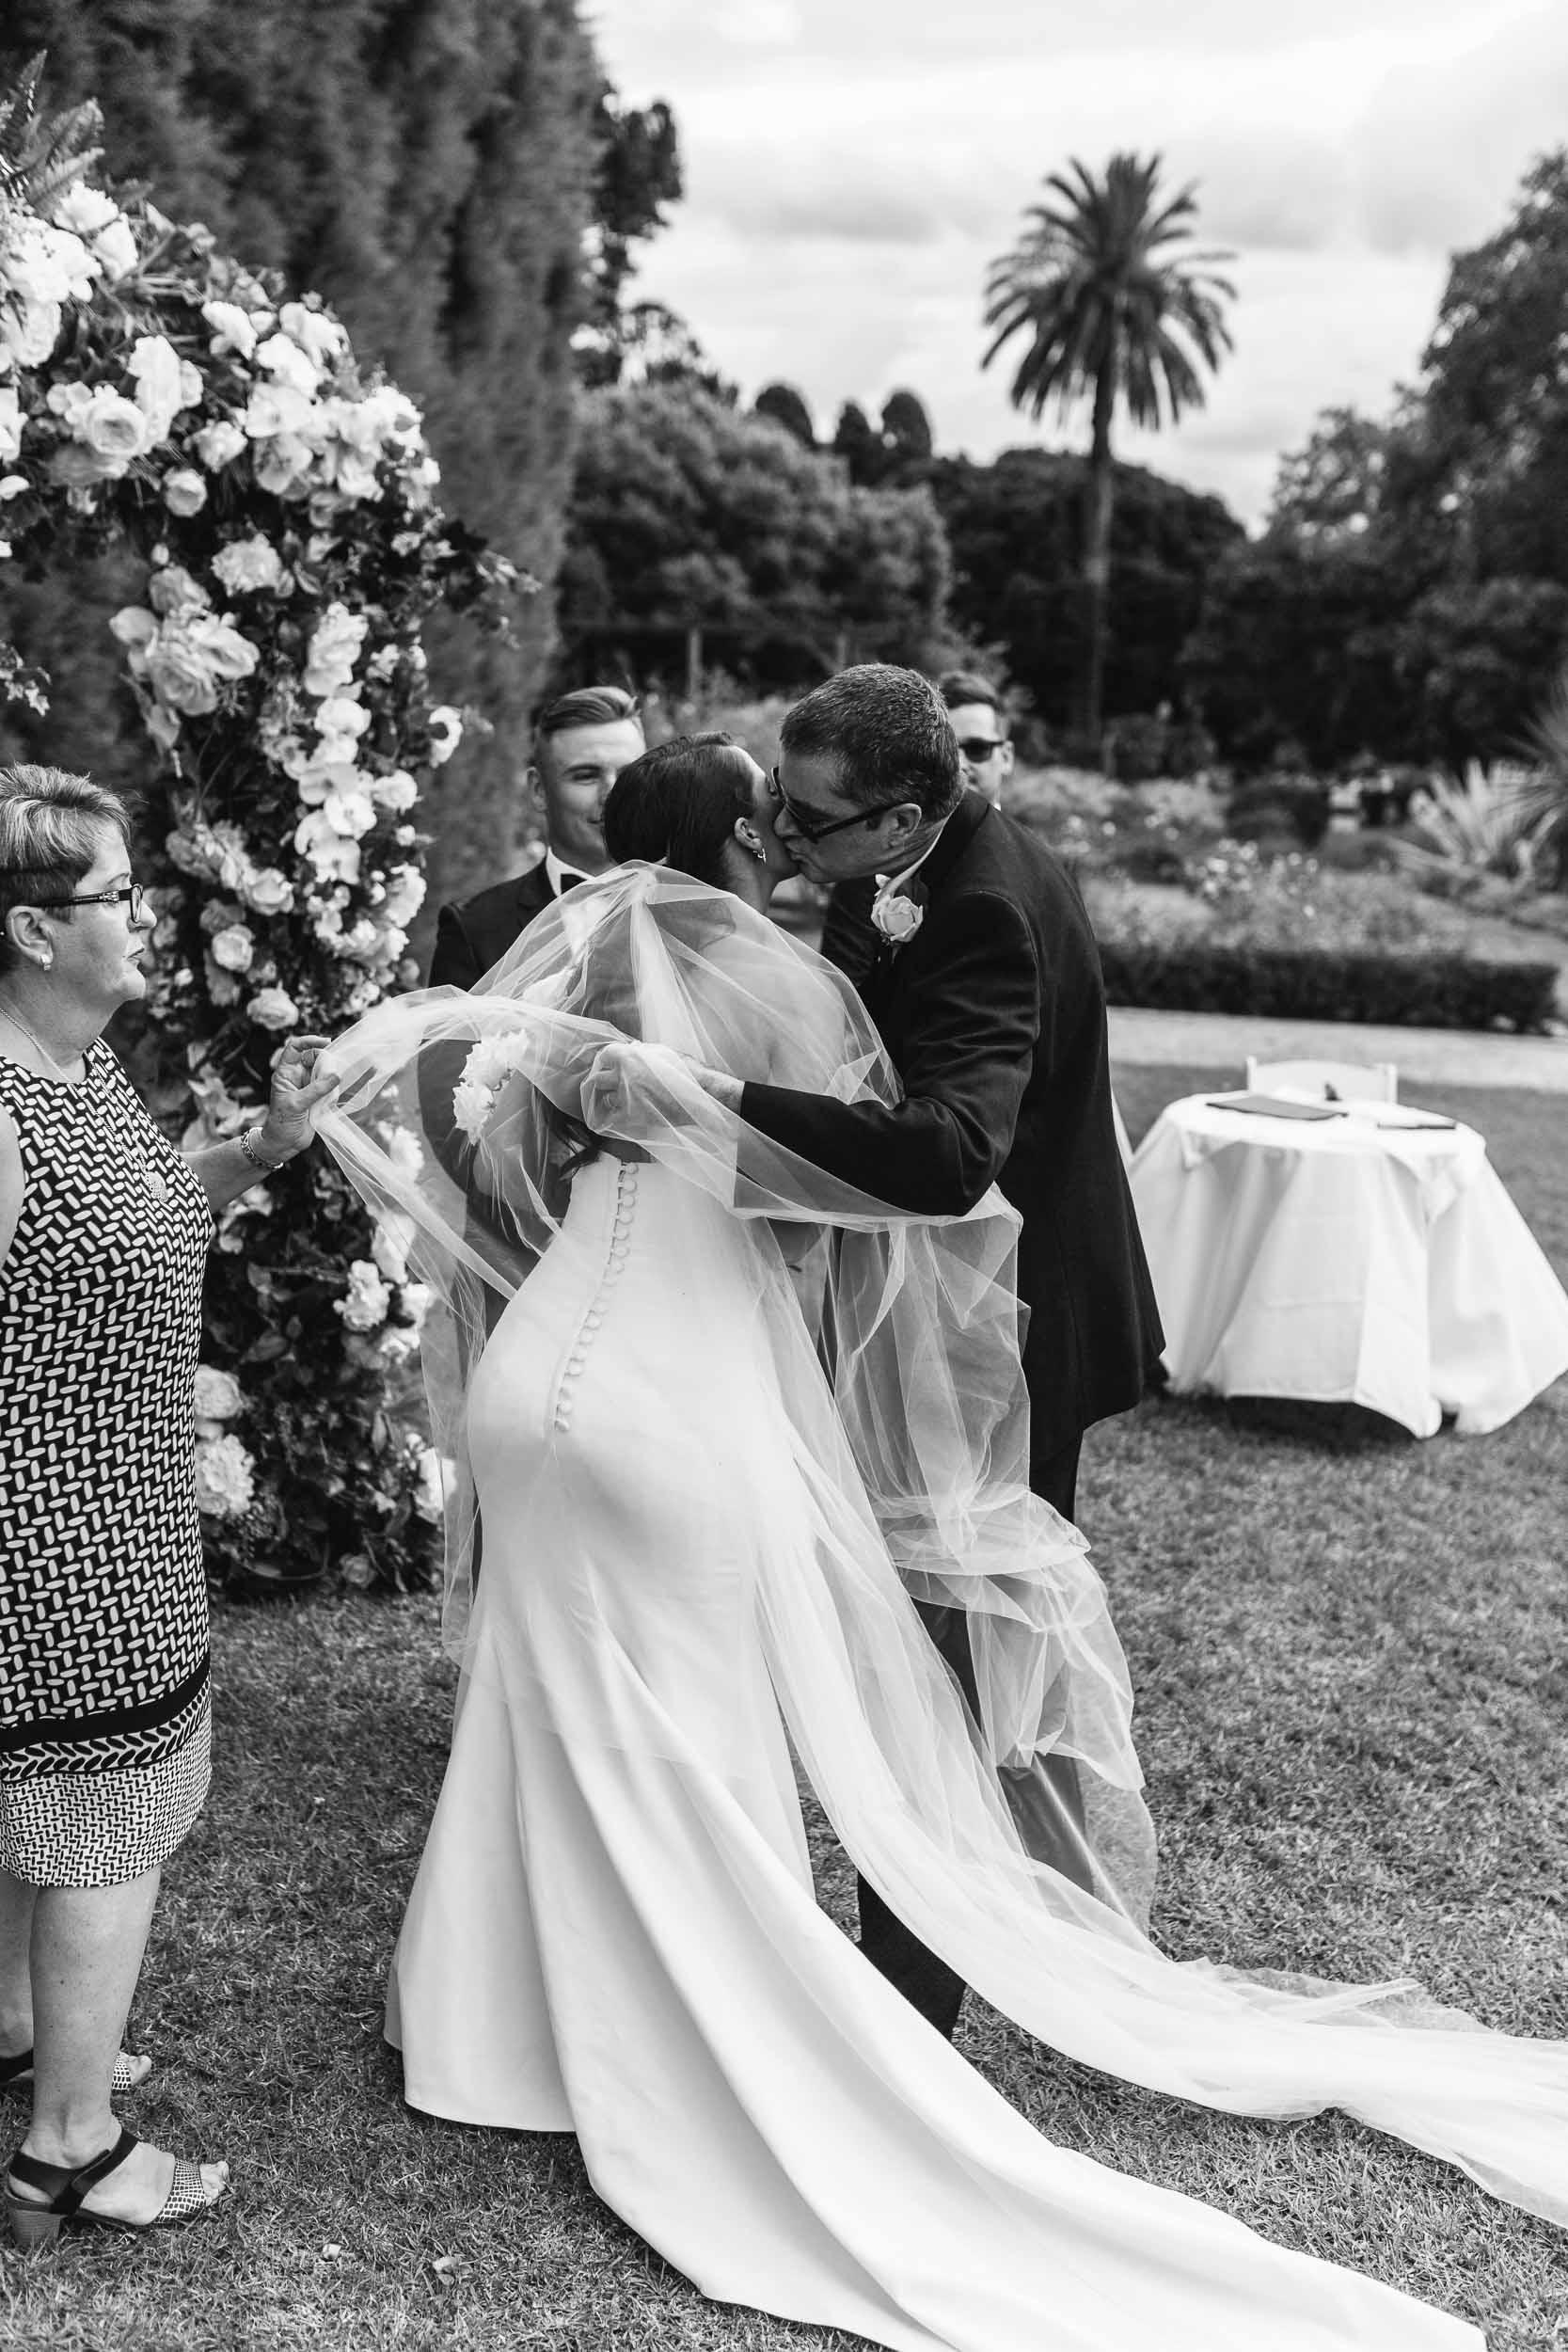 Kas-Richards-Melbourne-Garden-Wedding-Aerial-South-Whark-Georgia-Young-Couture-176.jpg